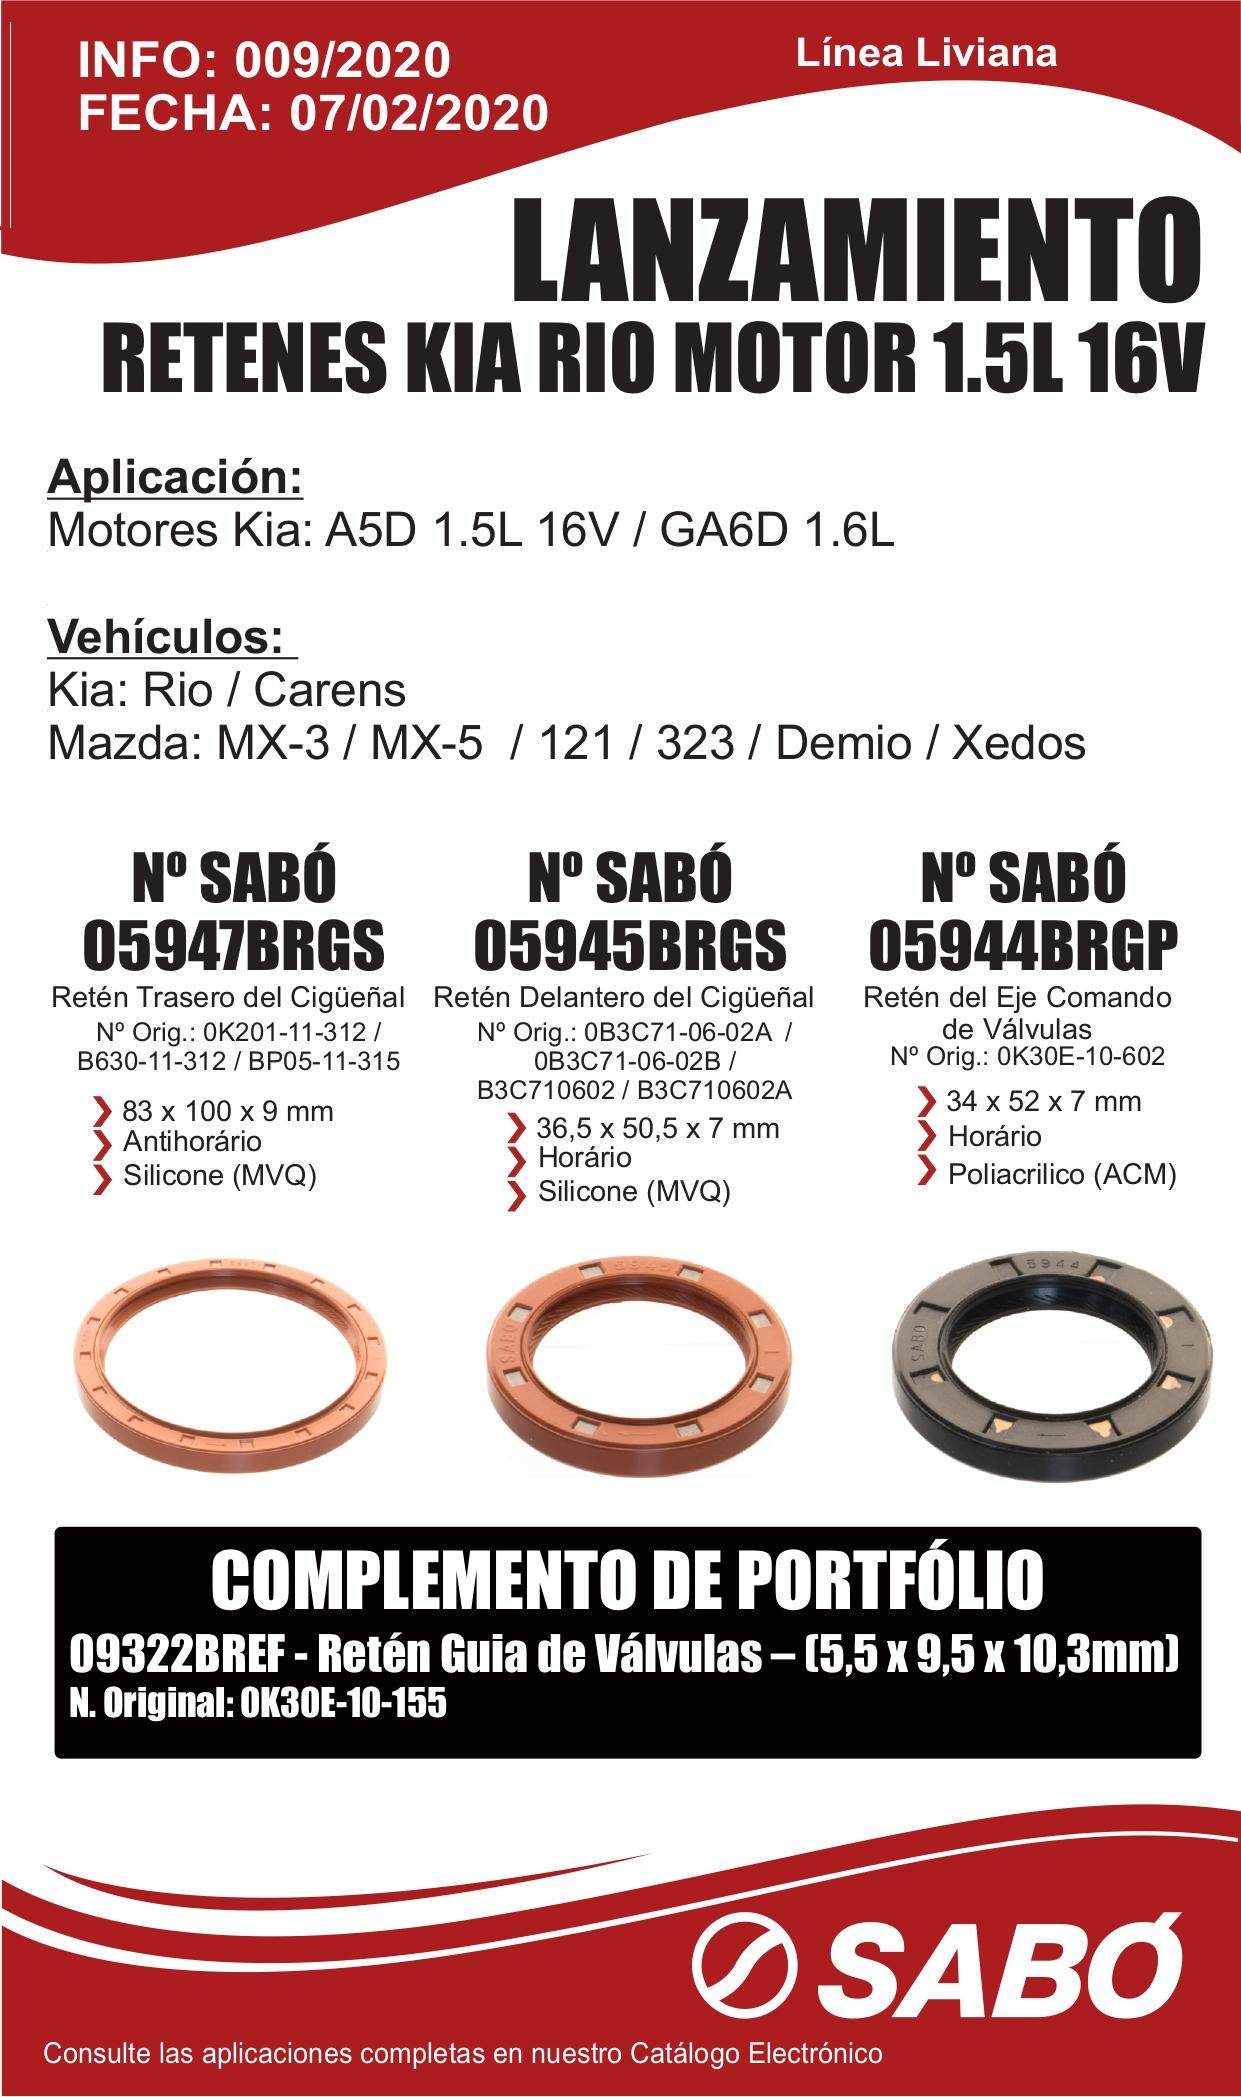 Info 009 Lanzamiento Retenes Kia Rio Motor A5D 1.5L 16V_GA6D 1.6L Linea Liviana_page-0001